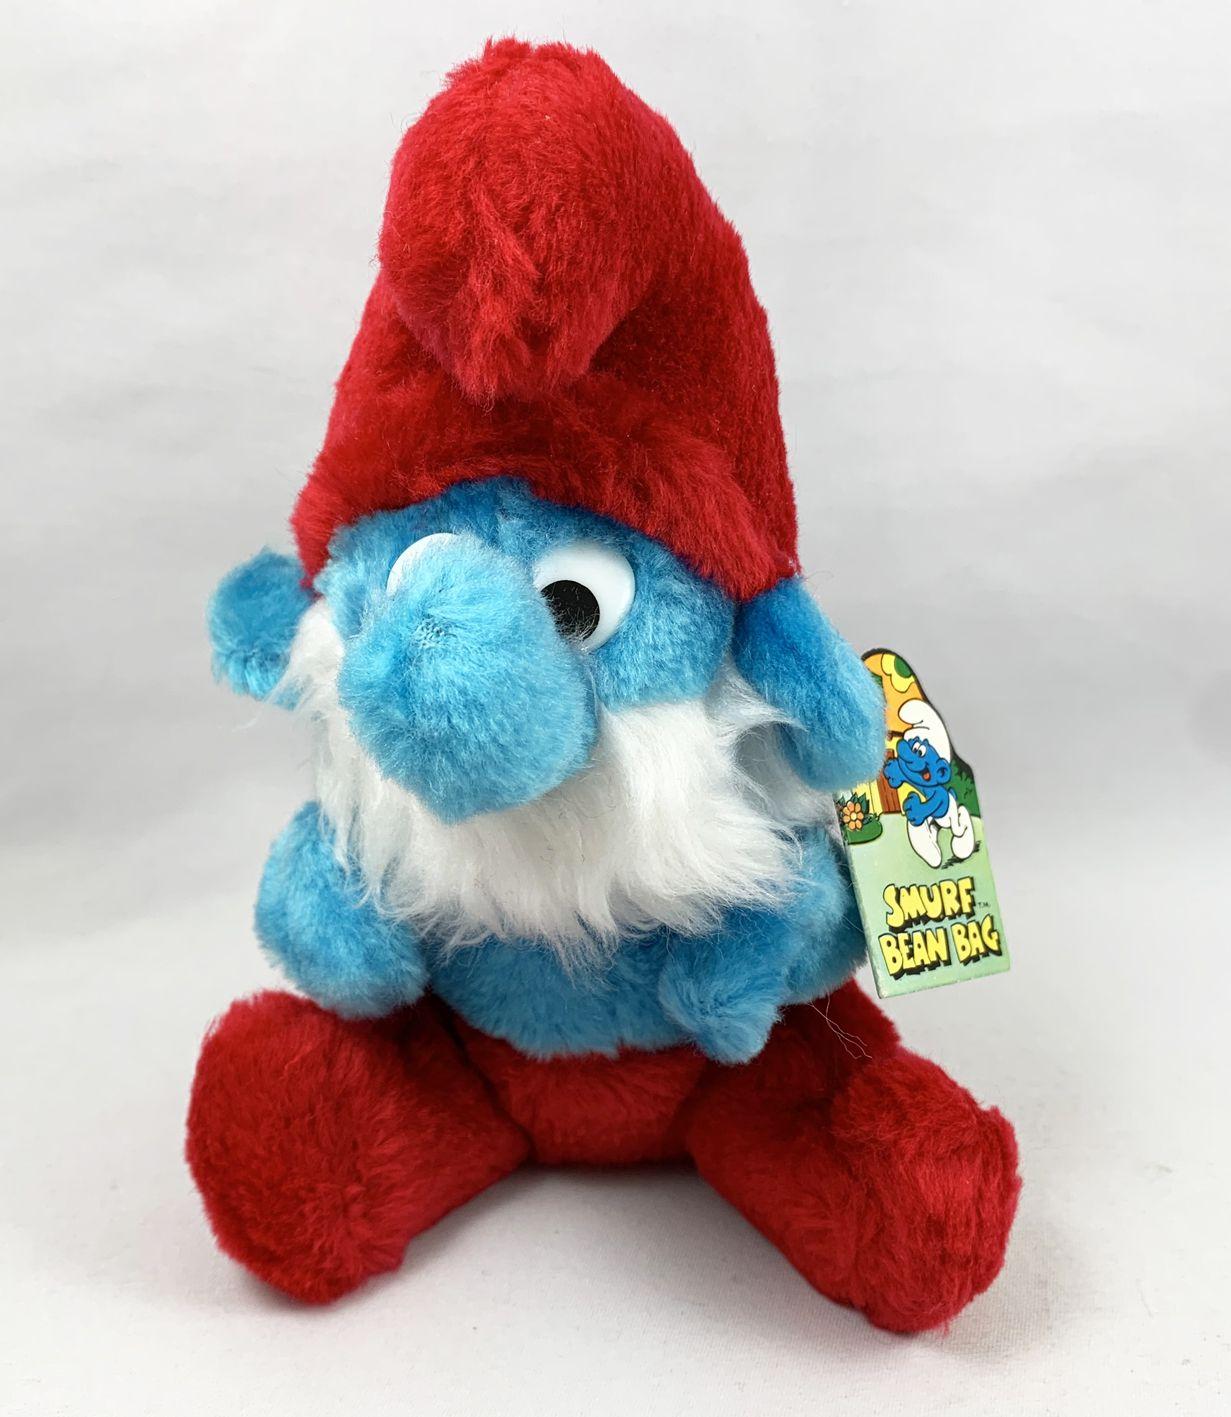 The Smurfs Bean Bag Schleich Wallace Berrie 8inch Papa Smurf